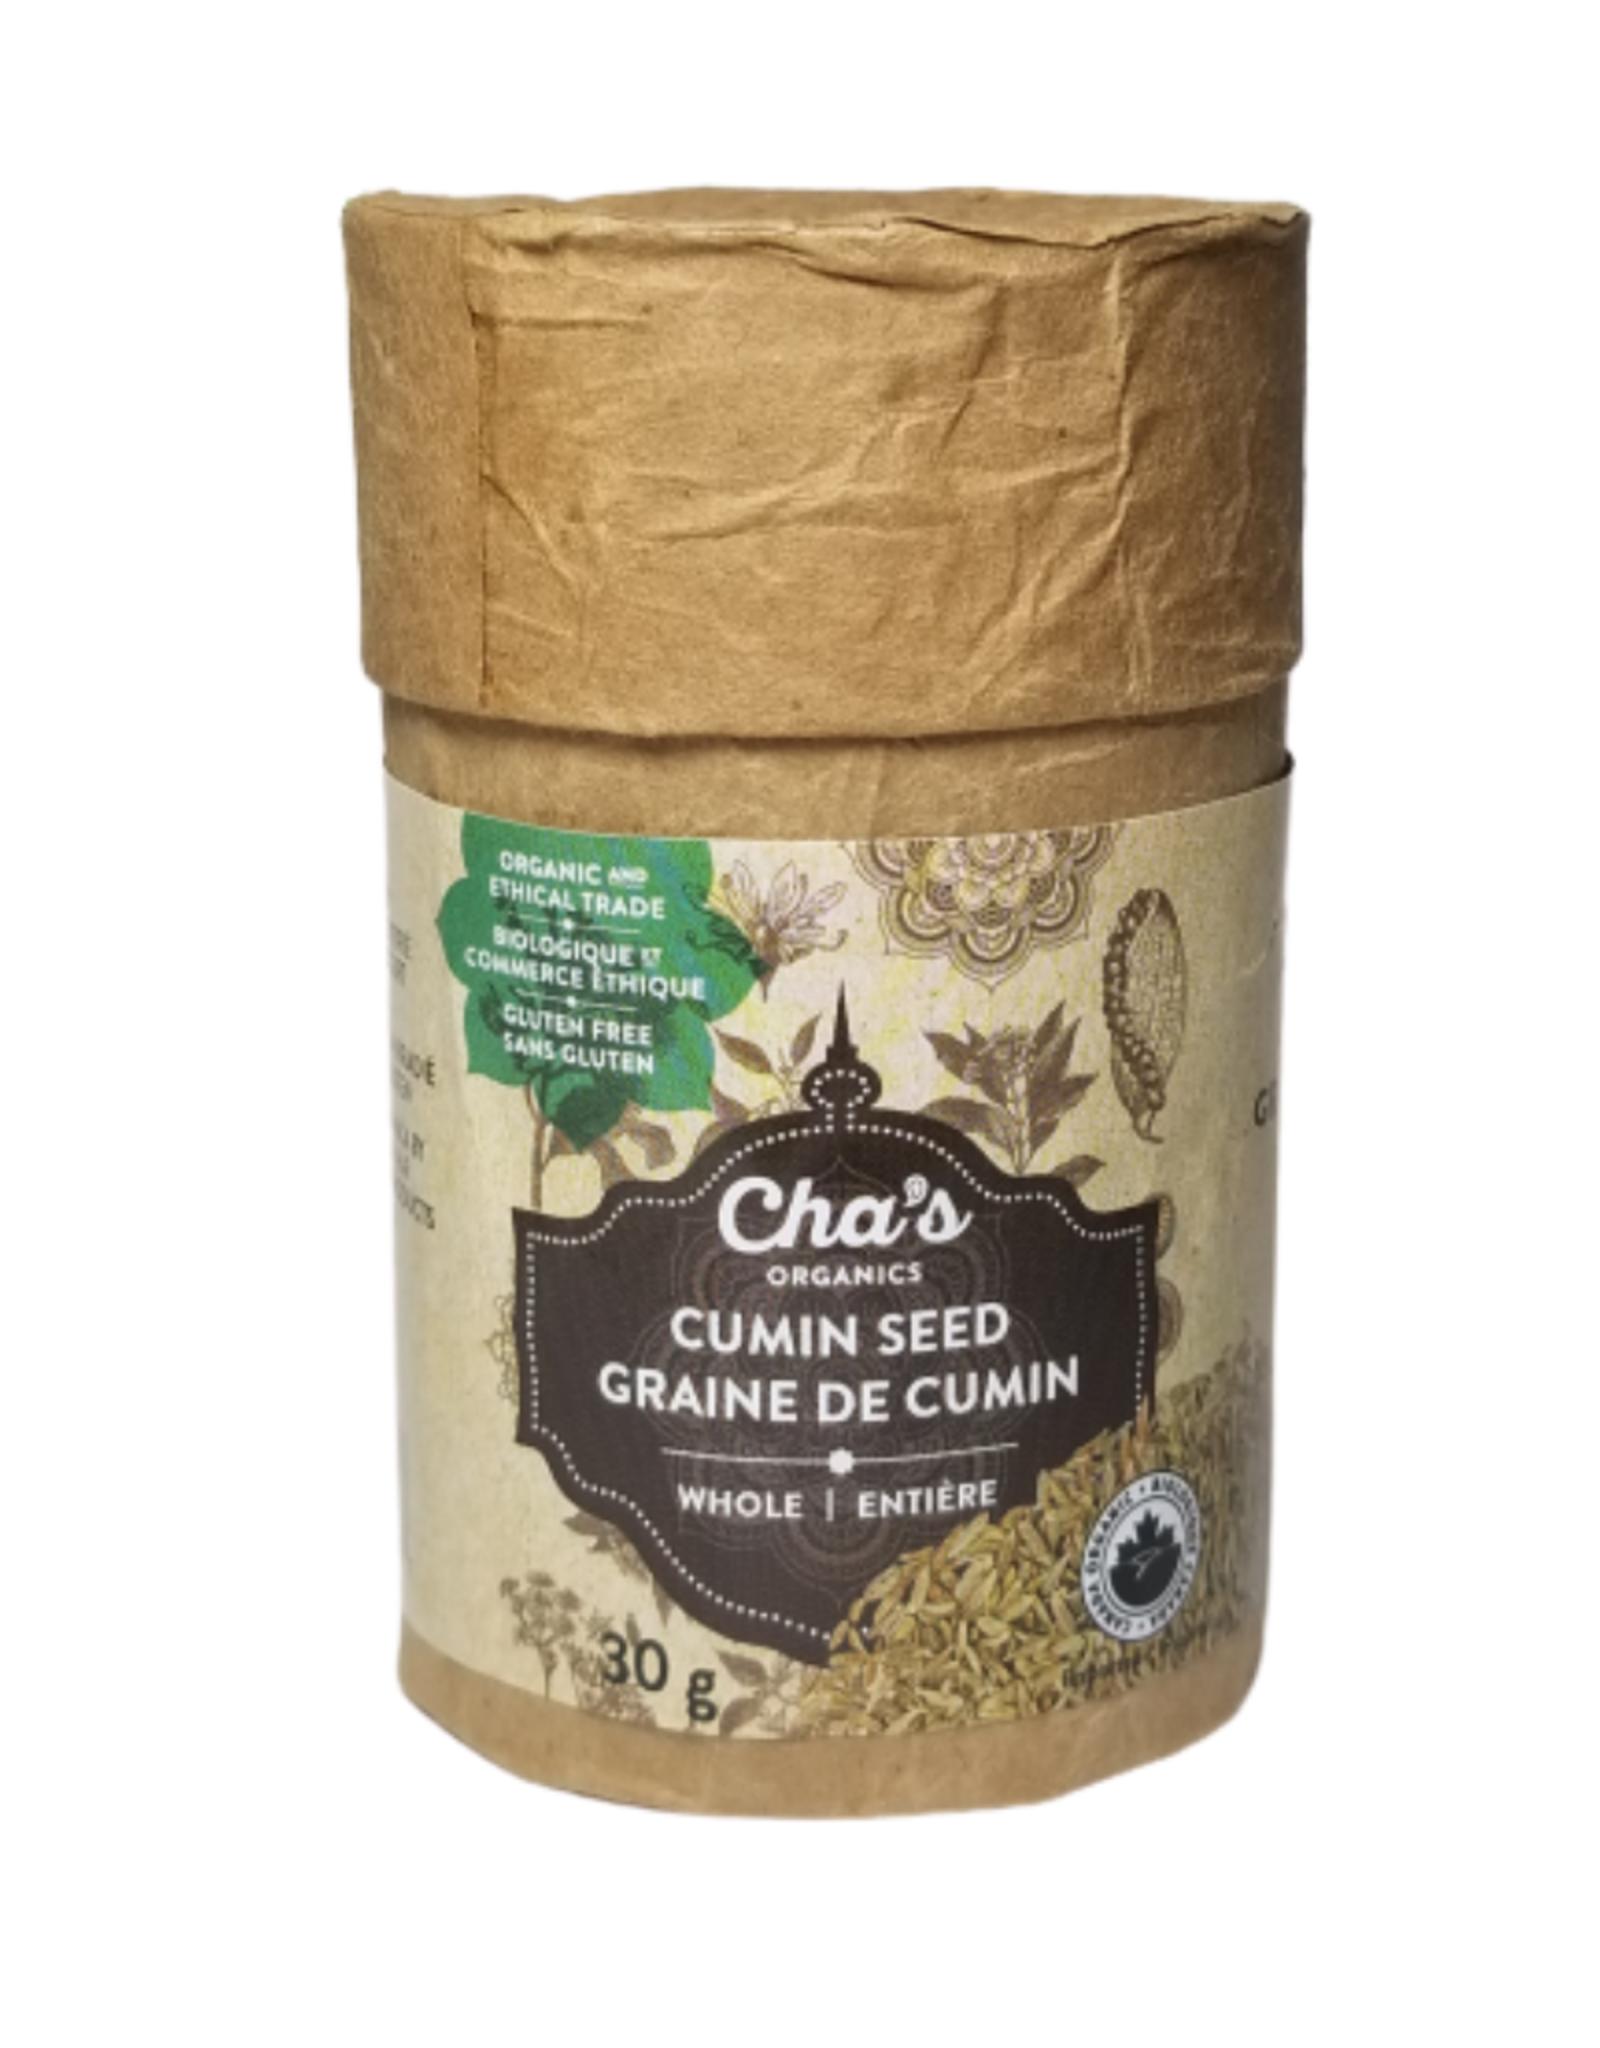 Cha's Organics Cha's Cumin Seed 30g